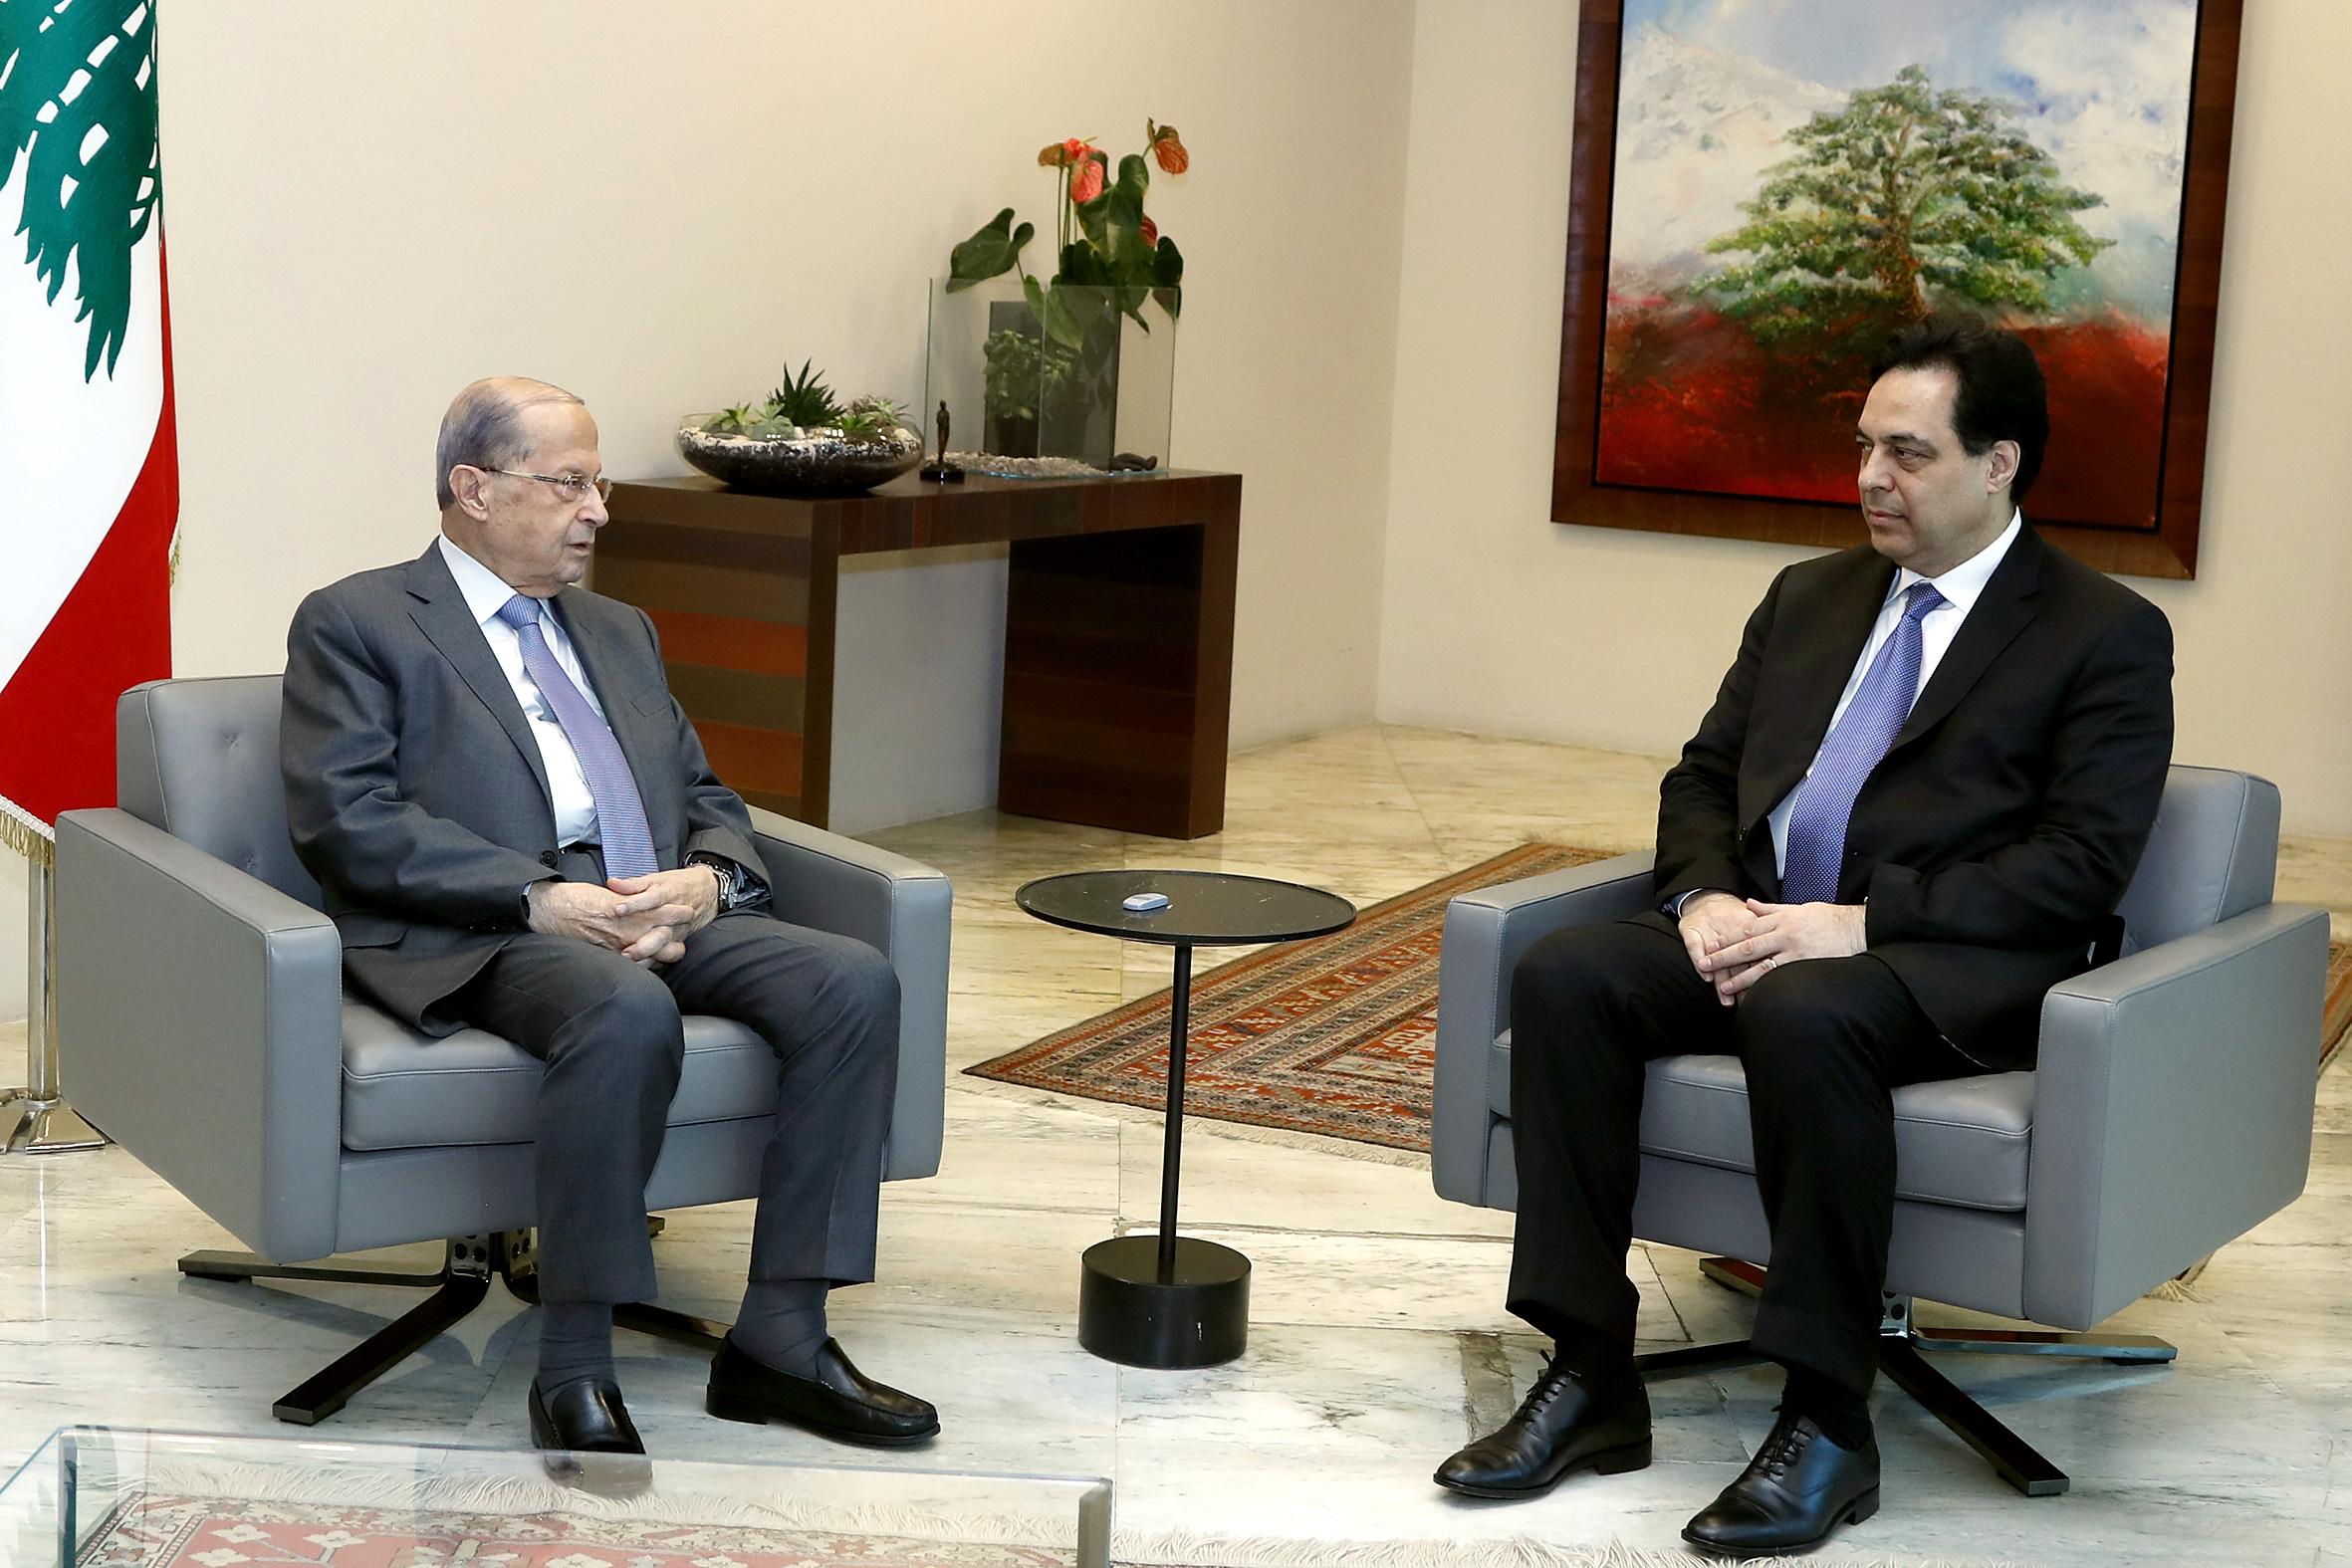 1 - Prime Minister Hassan Diab